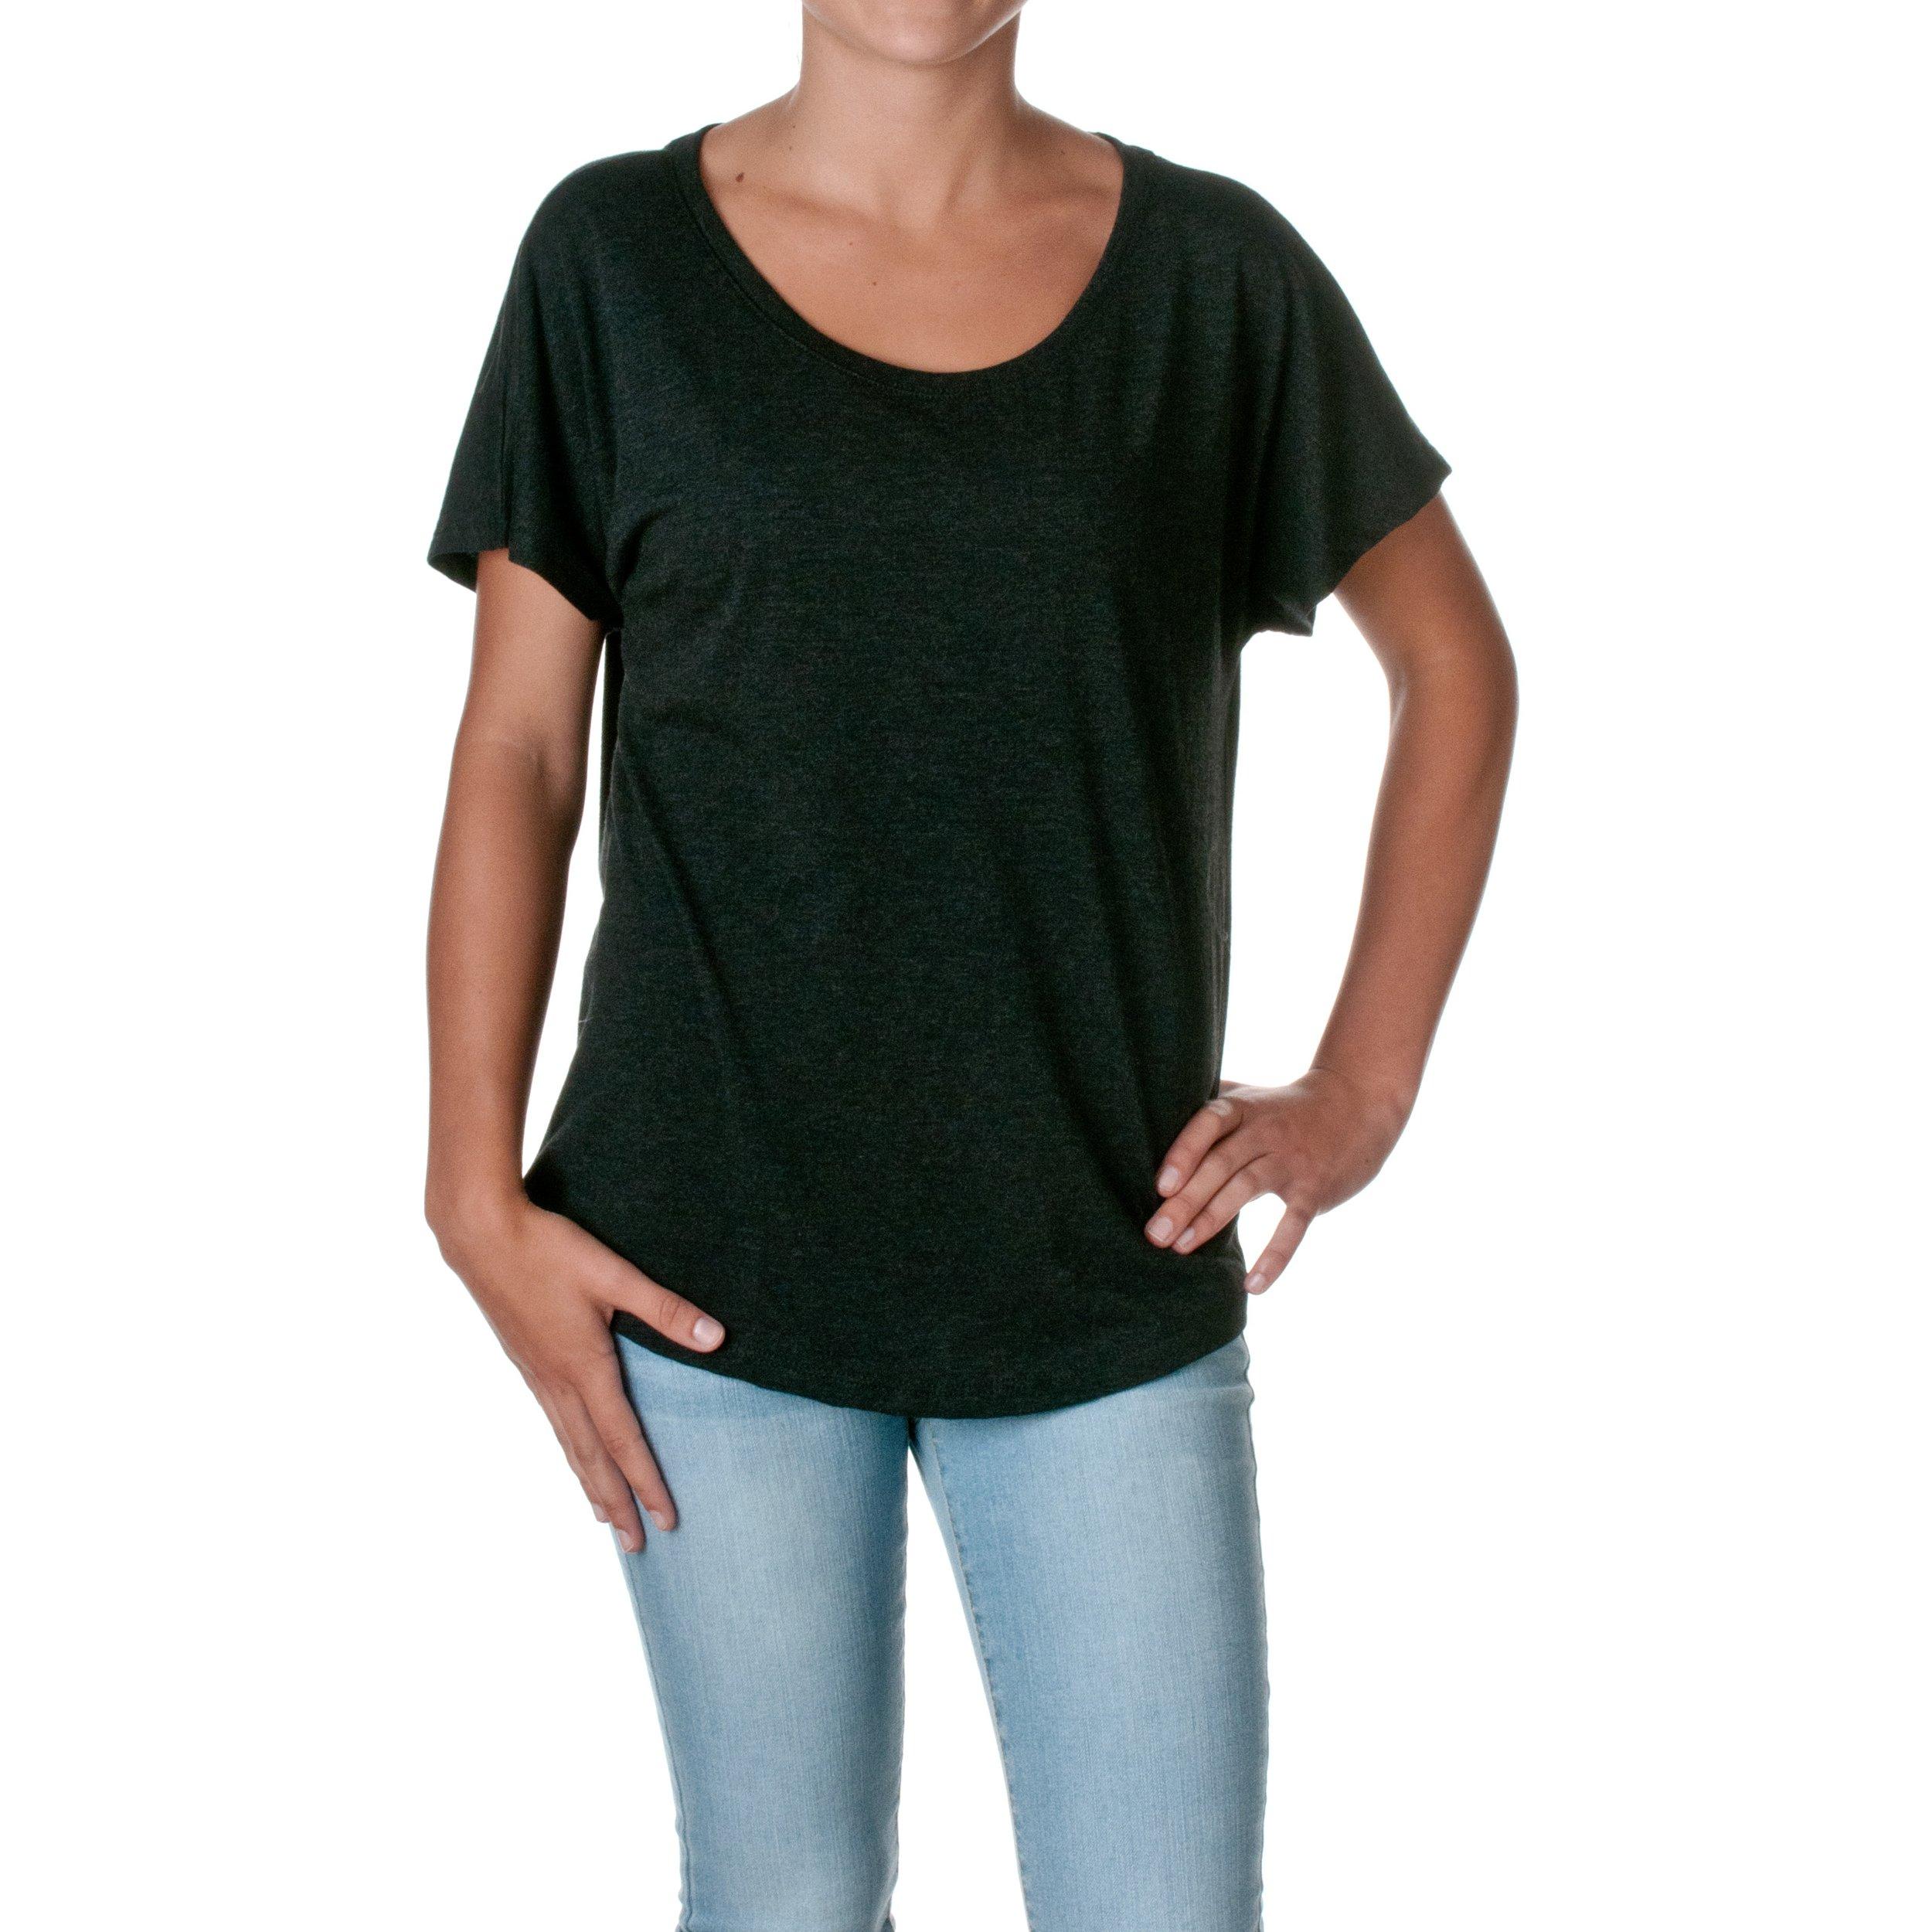 Next Level Apparel Women's Tri-Blend Dolman Top, Black Heather, XX-Large